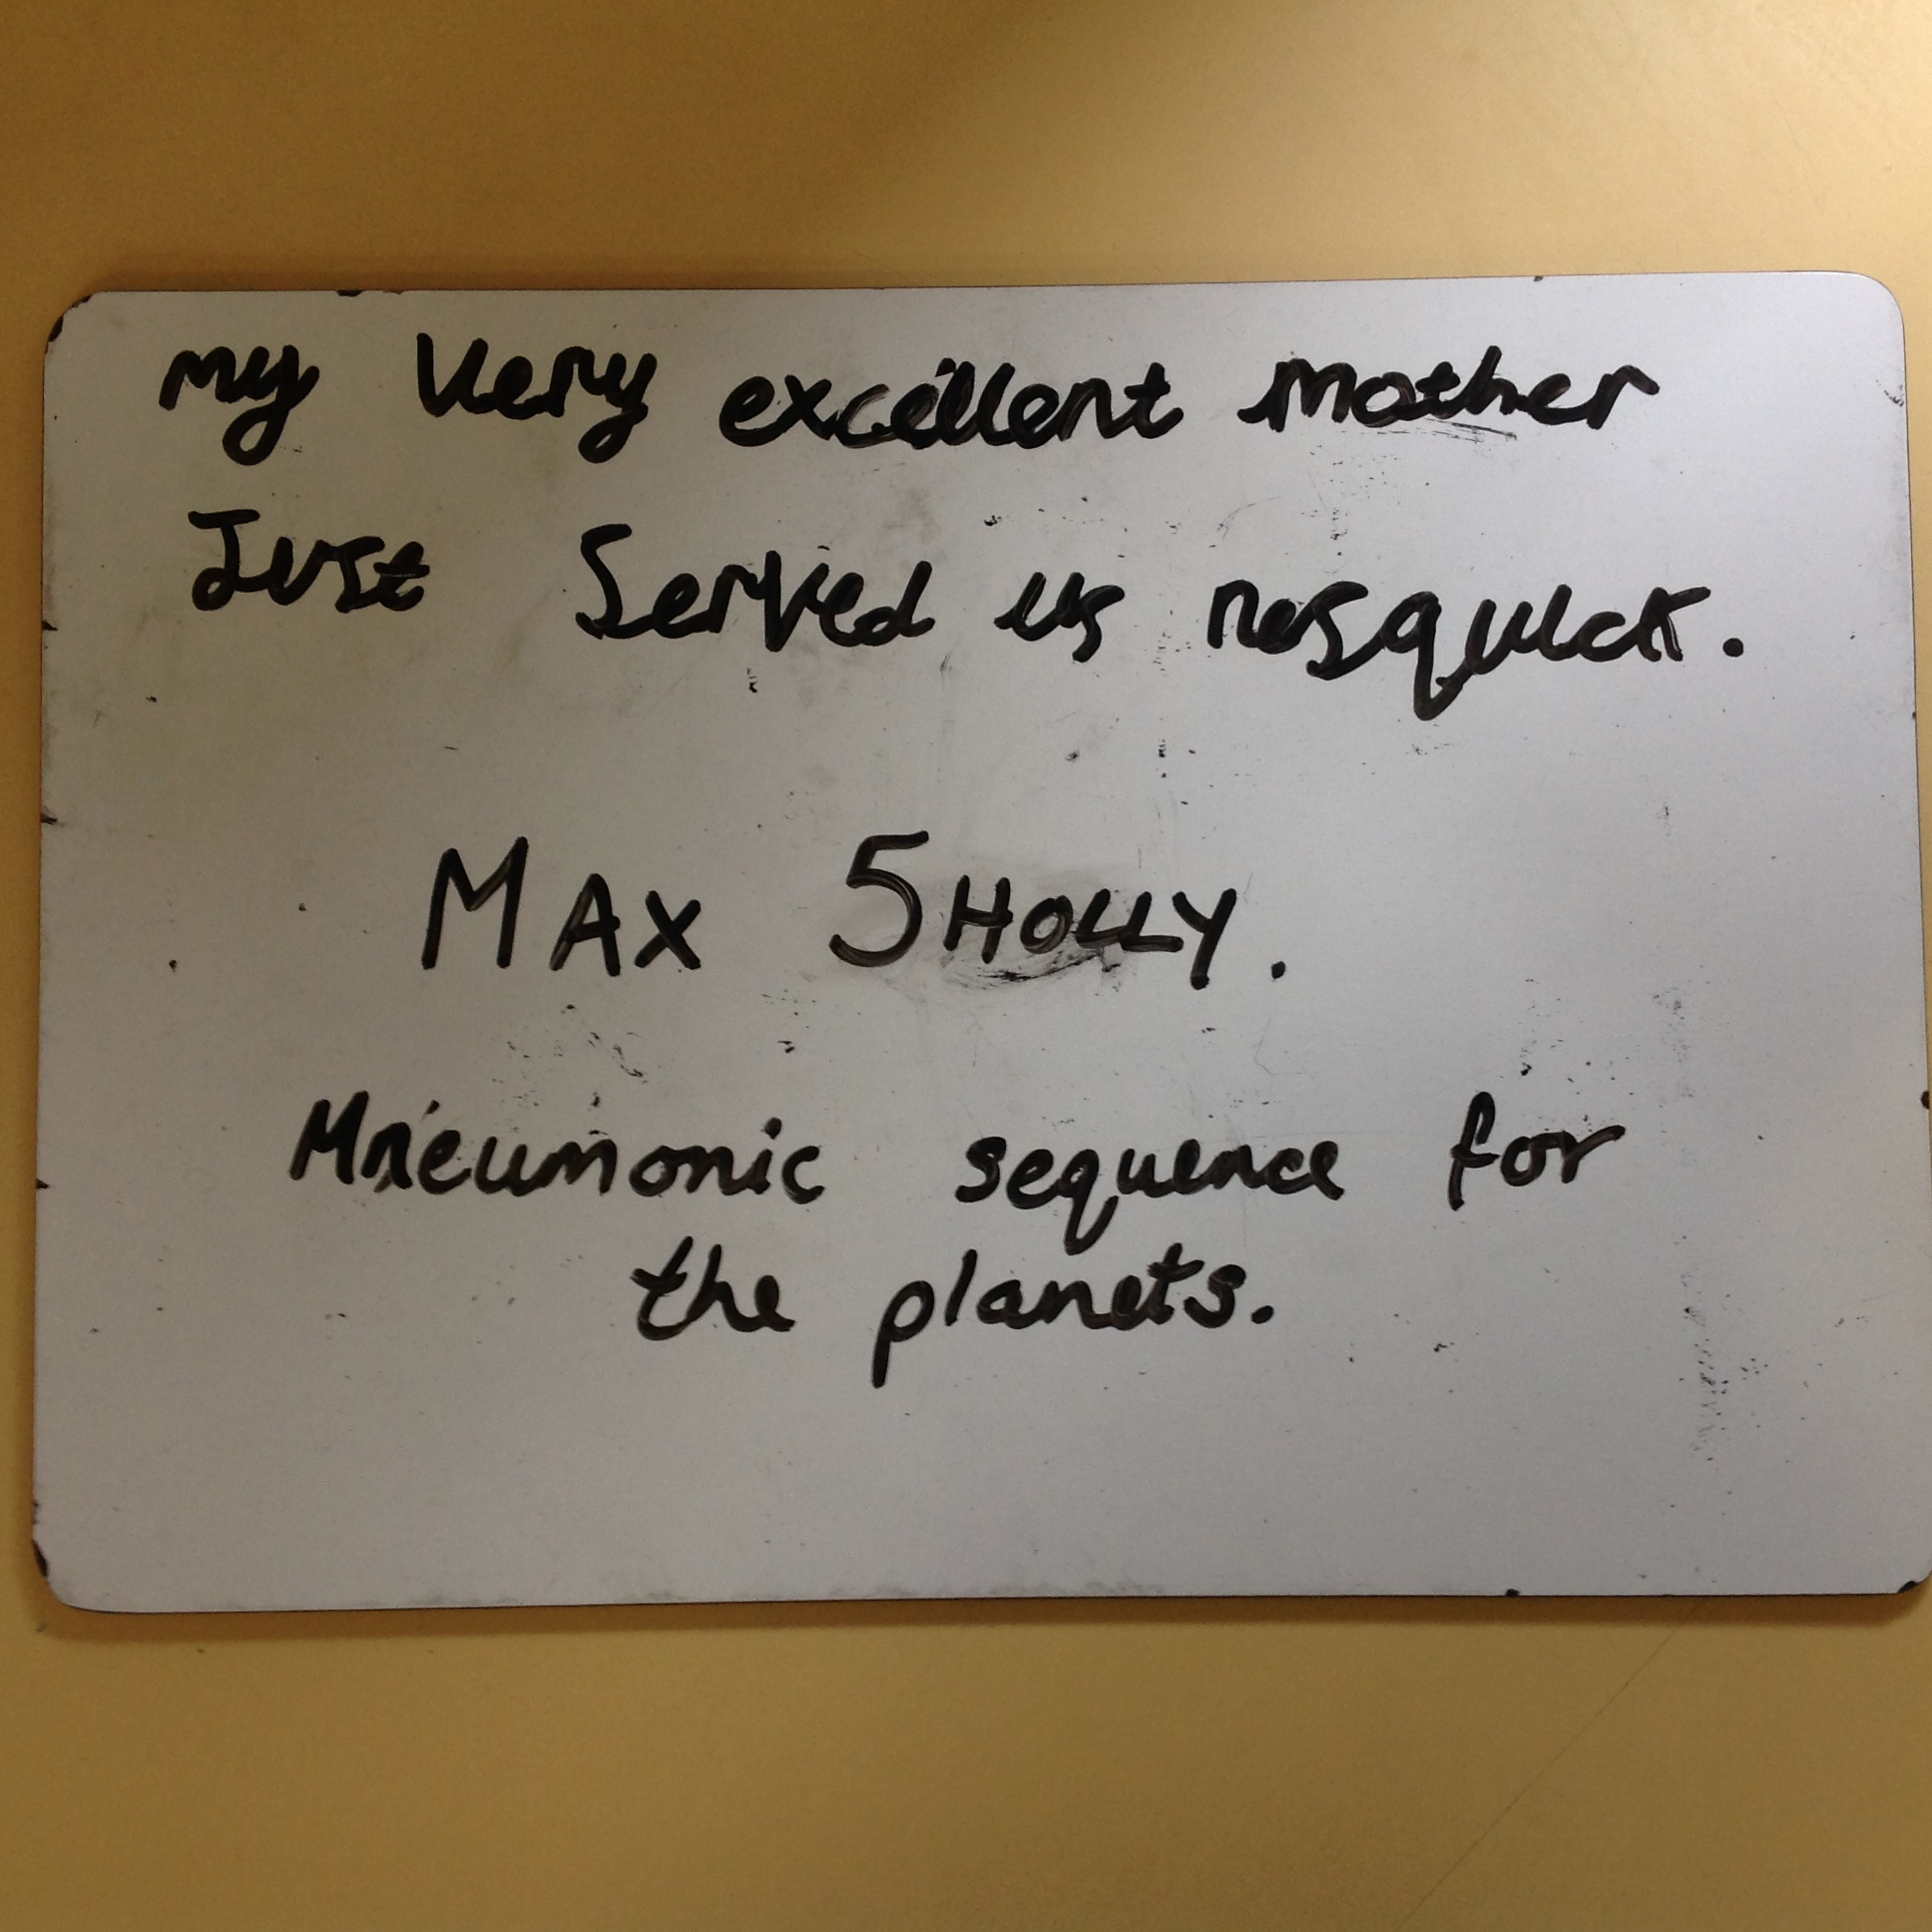 Max's brilliant mnemonic!